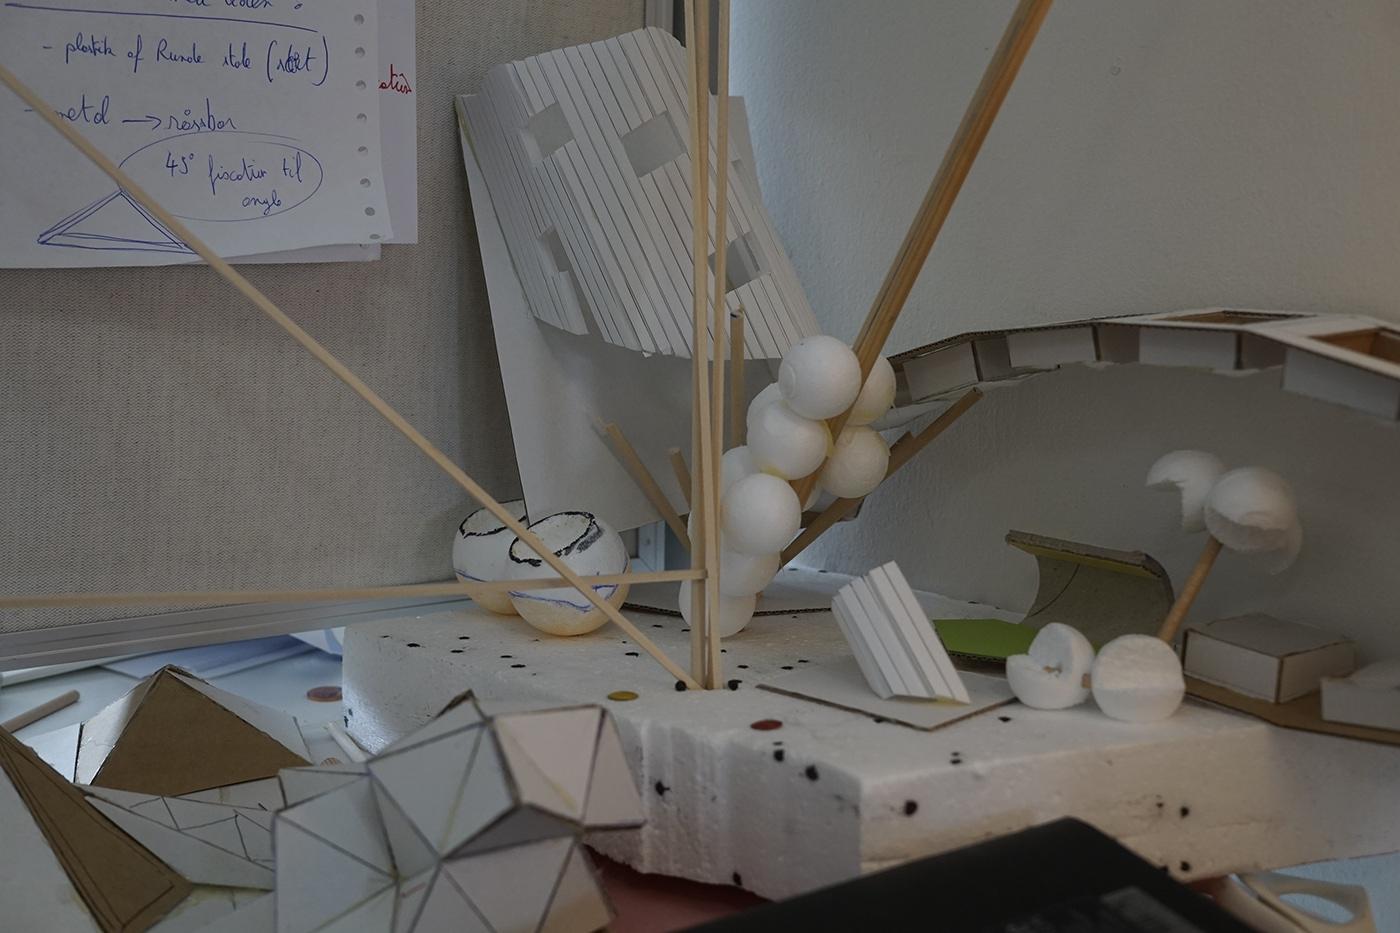 TRIPOTI - lamp installation on Behance